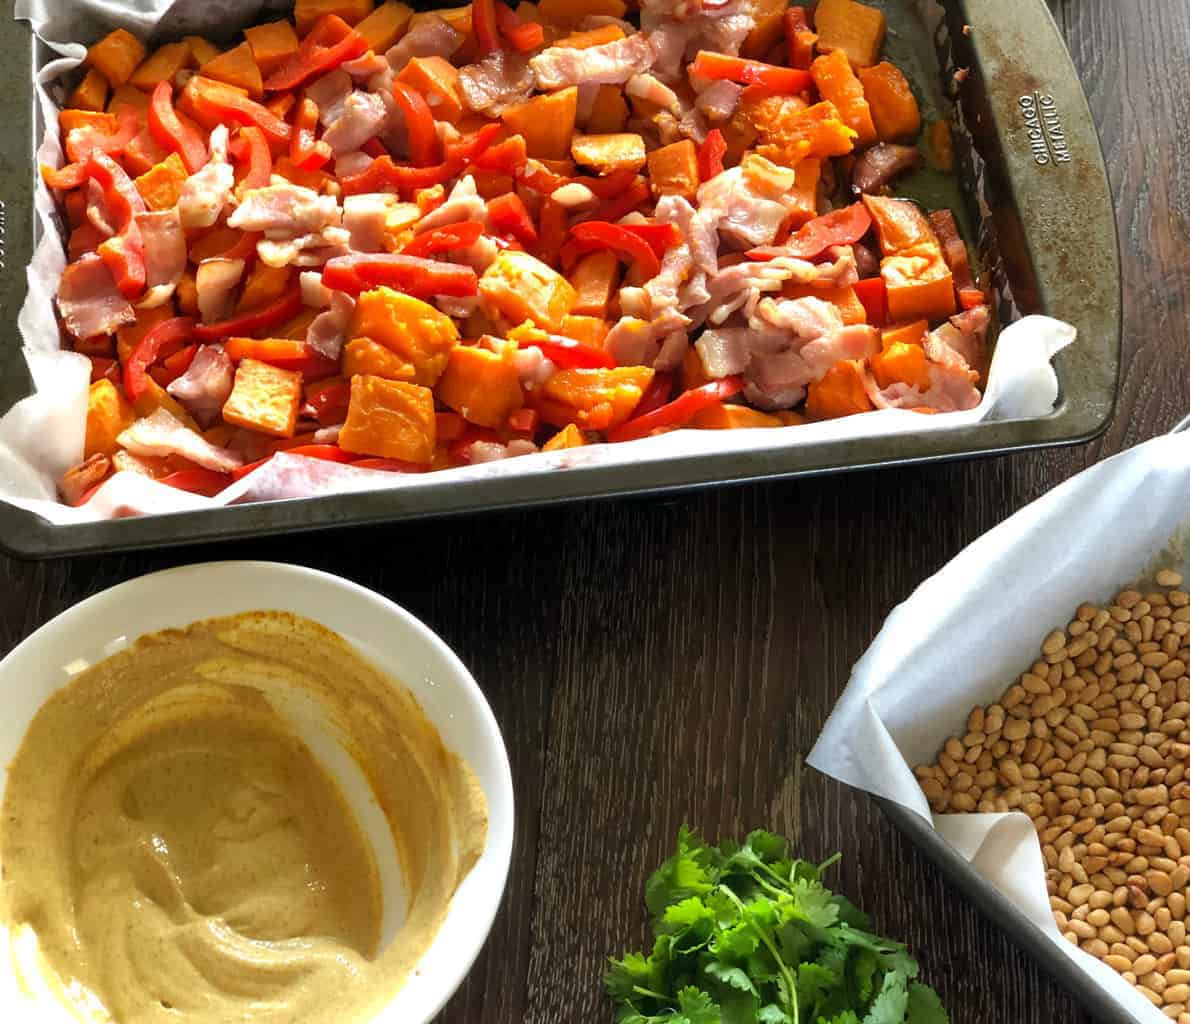 Final steps in making Kumara and Bacon Salad.